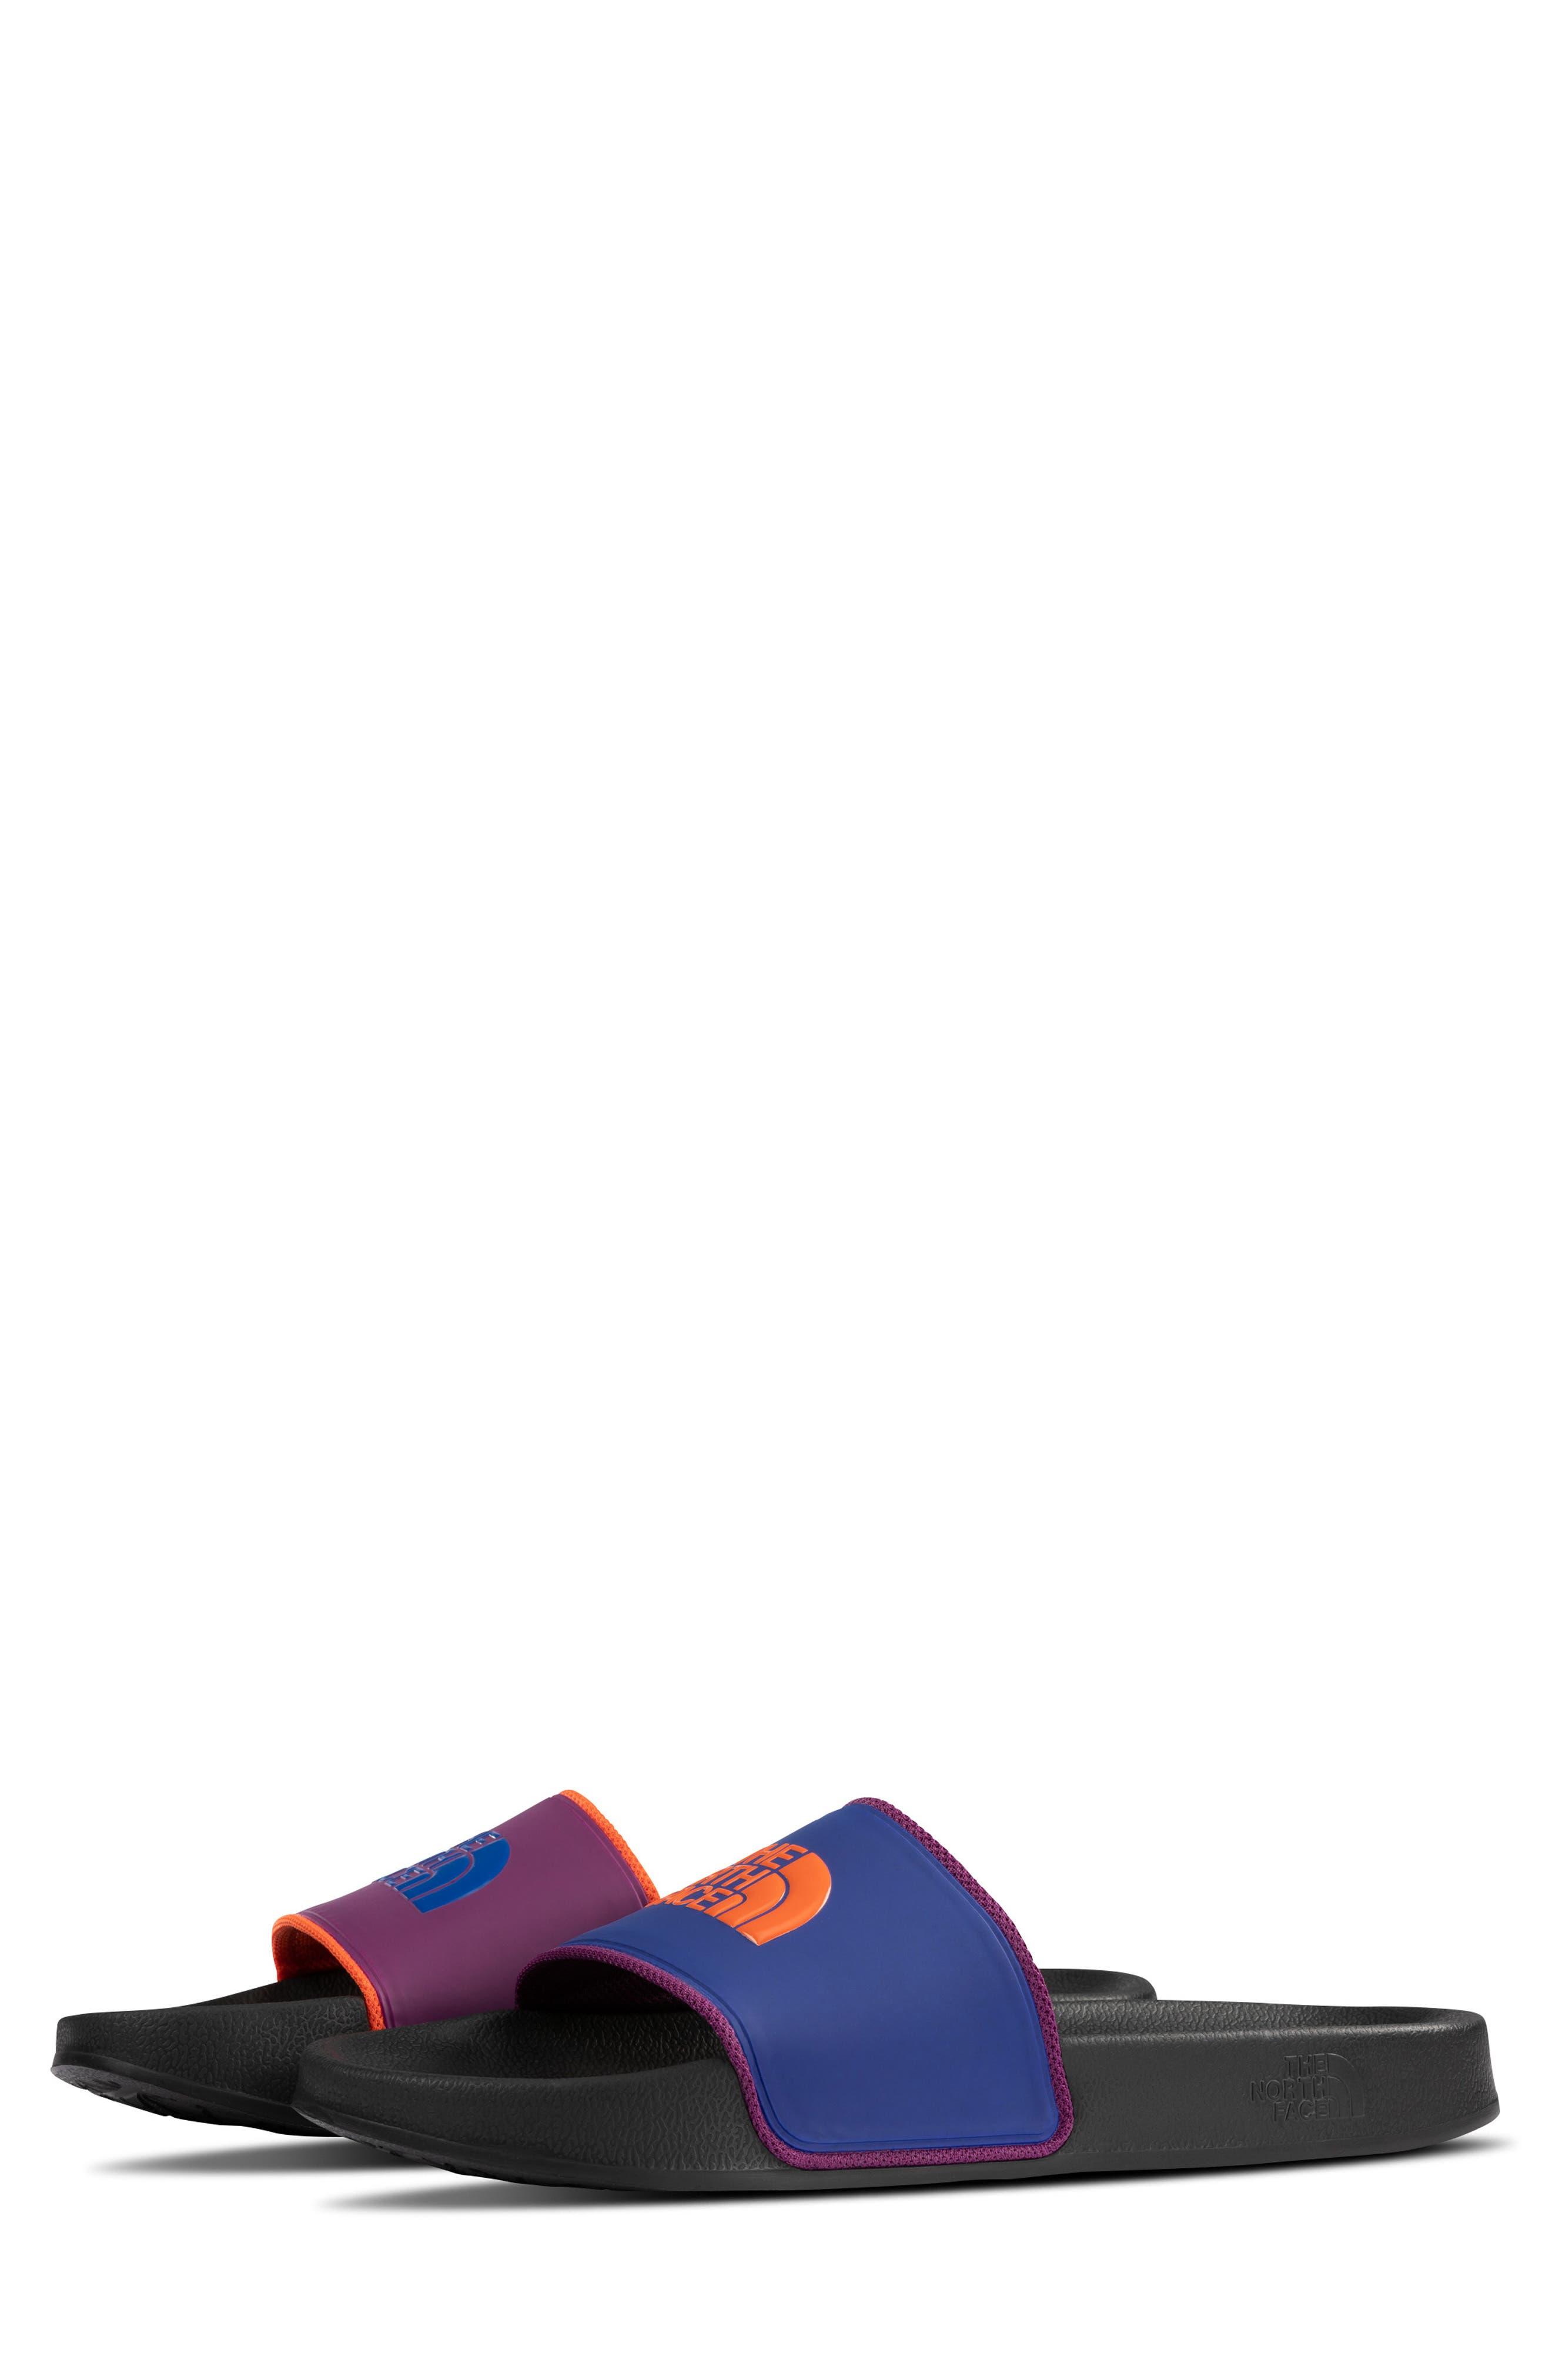 Base Camp II Slide Sandal,                             Alternate thumbnail 3, color,                             TNF BLACK/ AZTEC BLUE